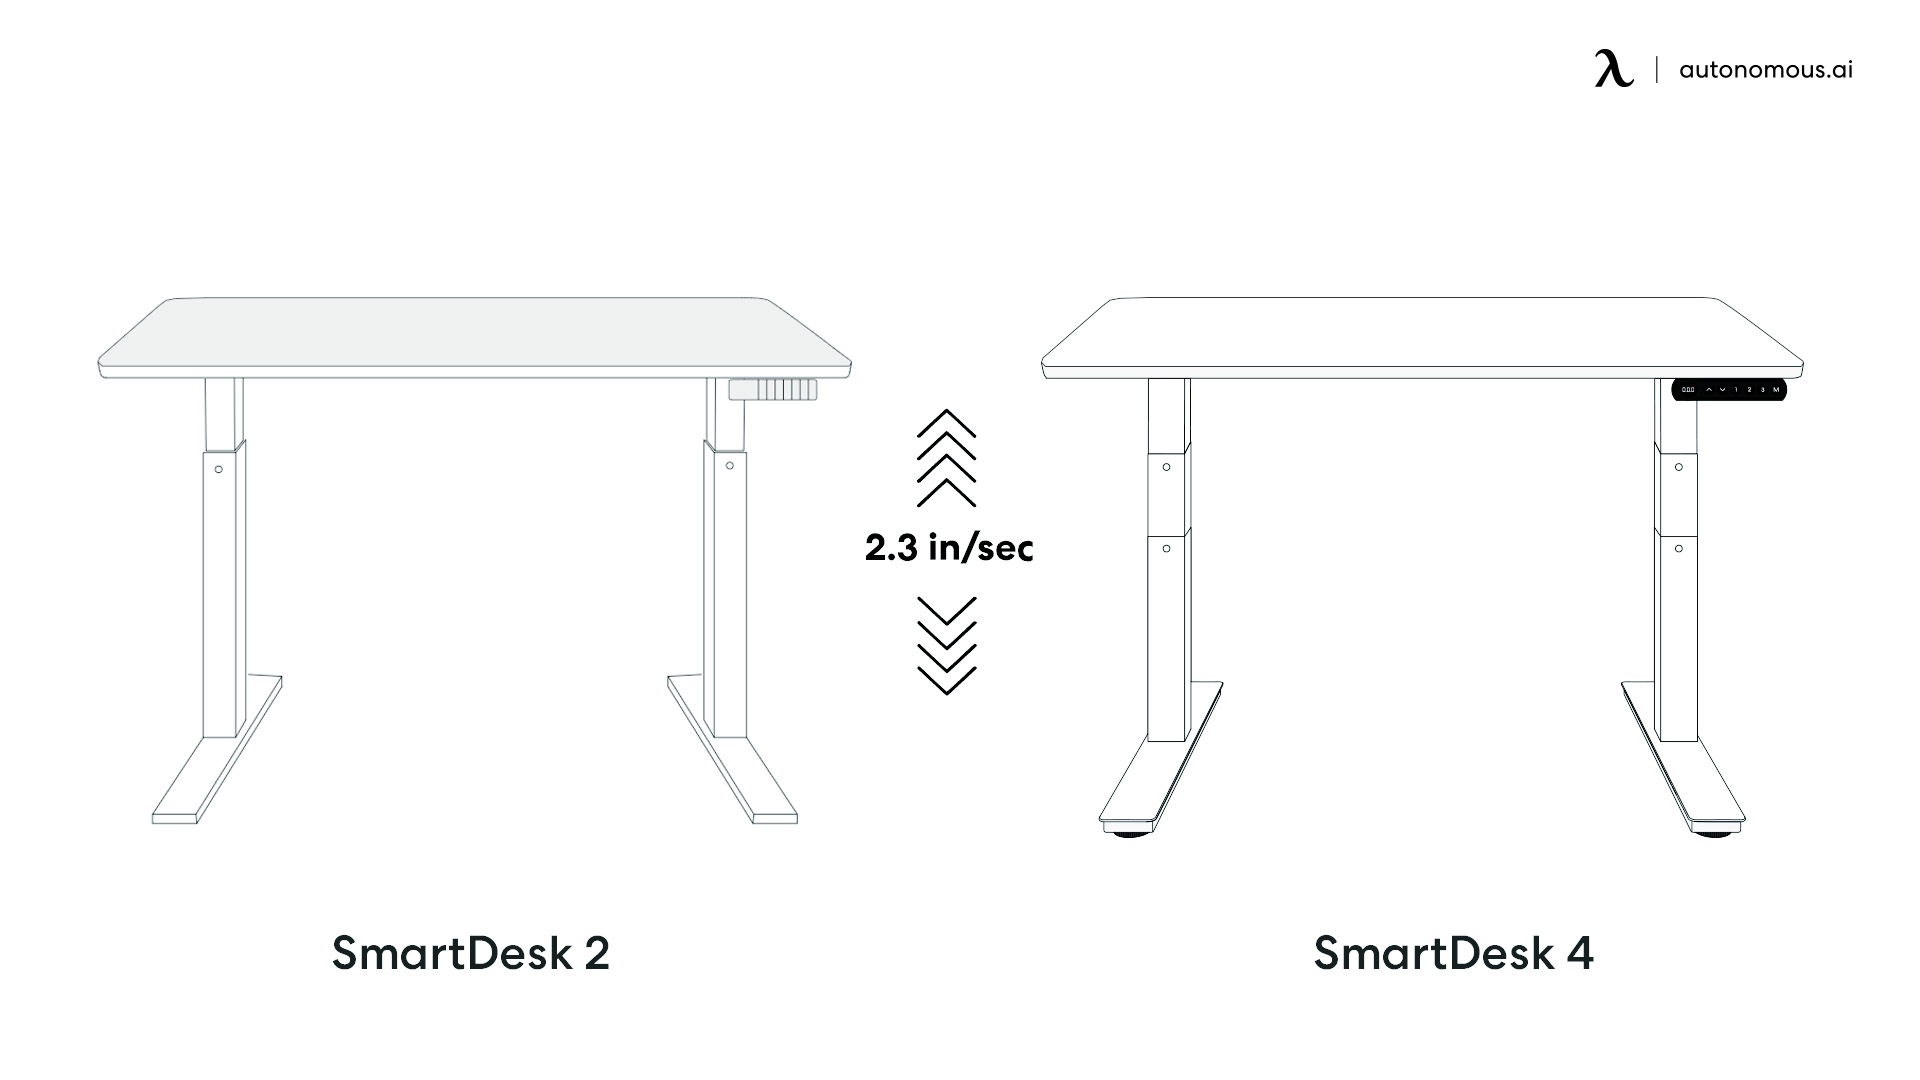 SmartDesk 4 vs SmartDesk 2 Lifting speed